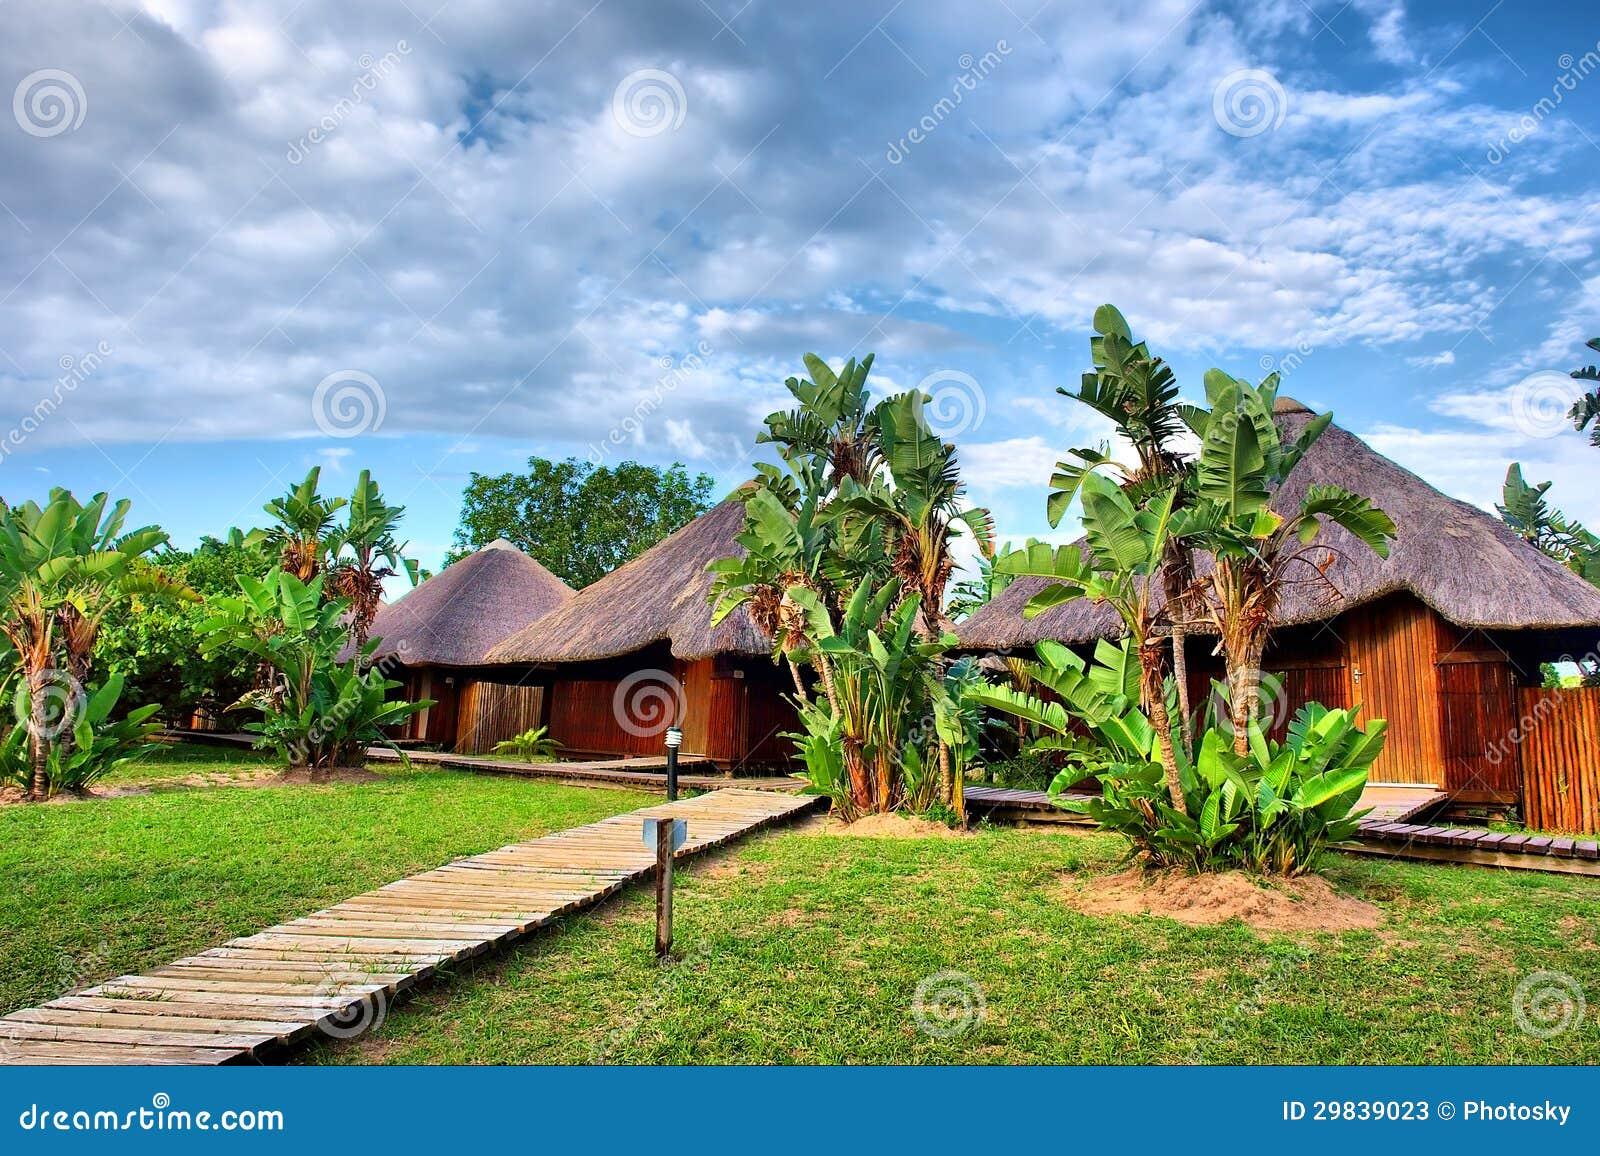 Trajeto aos chalés africanos de madeira